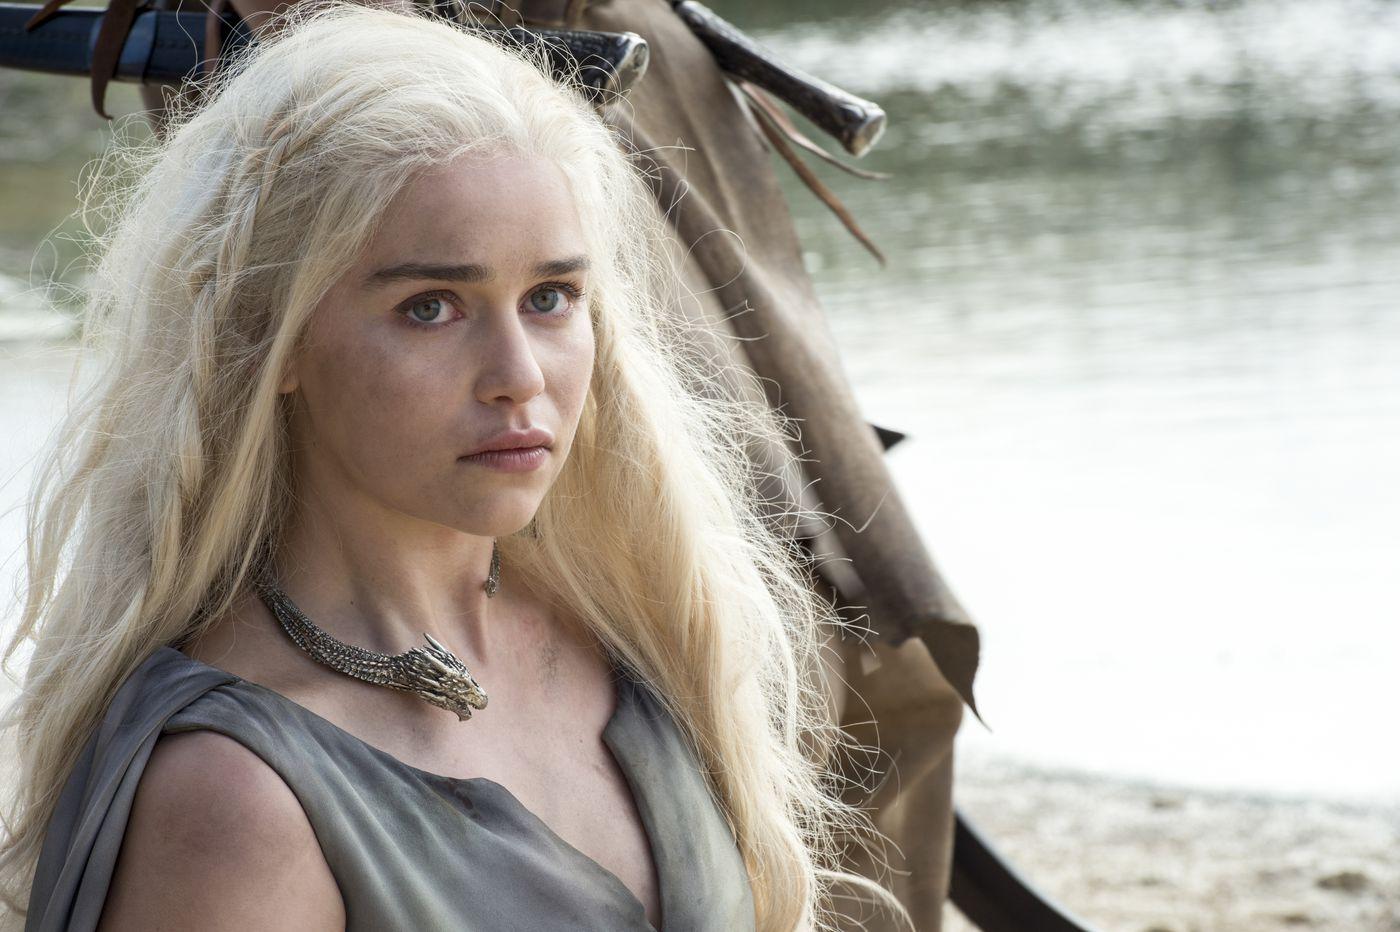 Daenerys Targaryen is going to die - Polygon